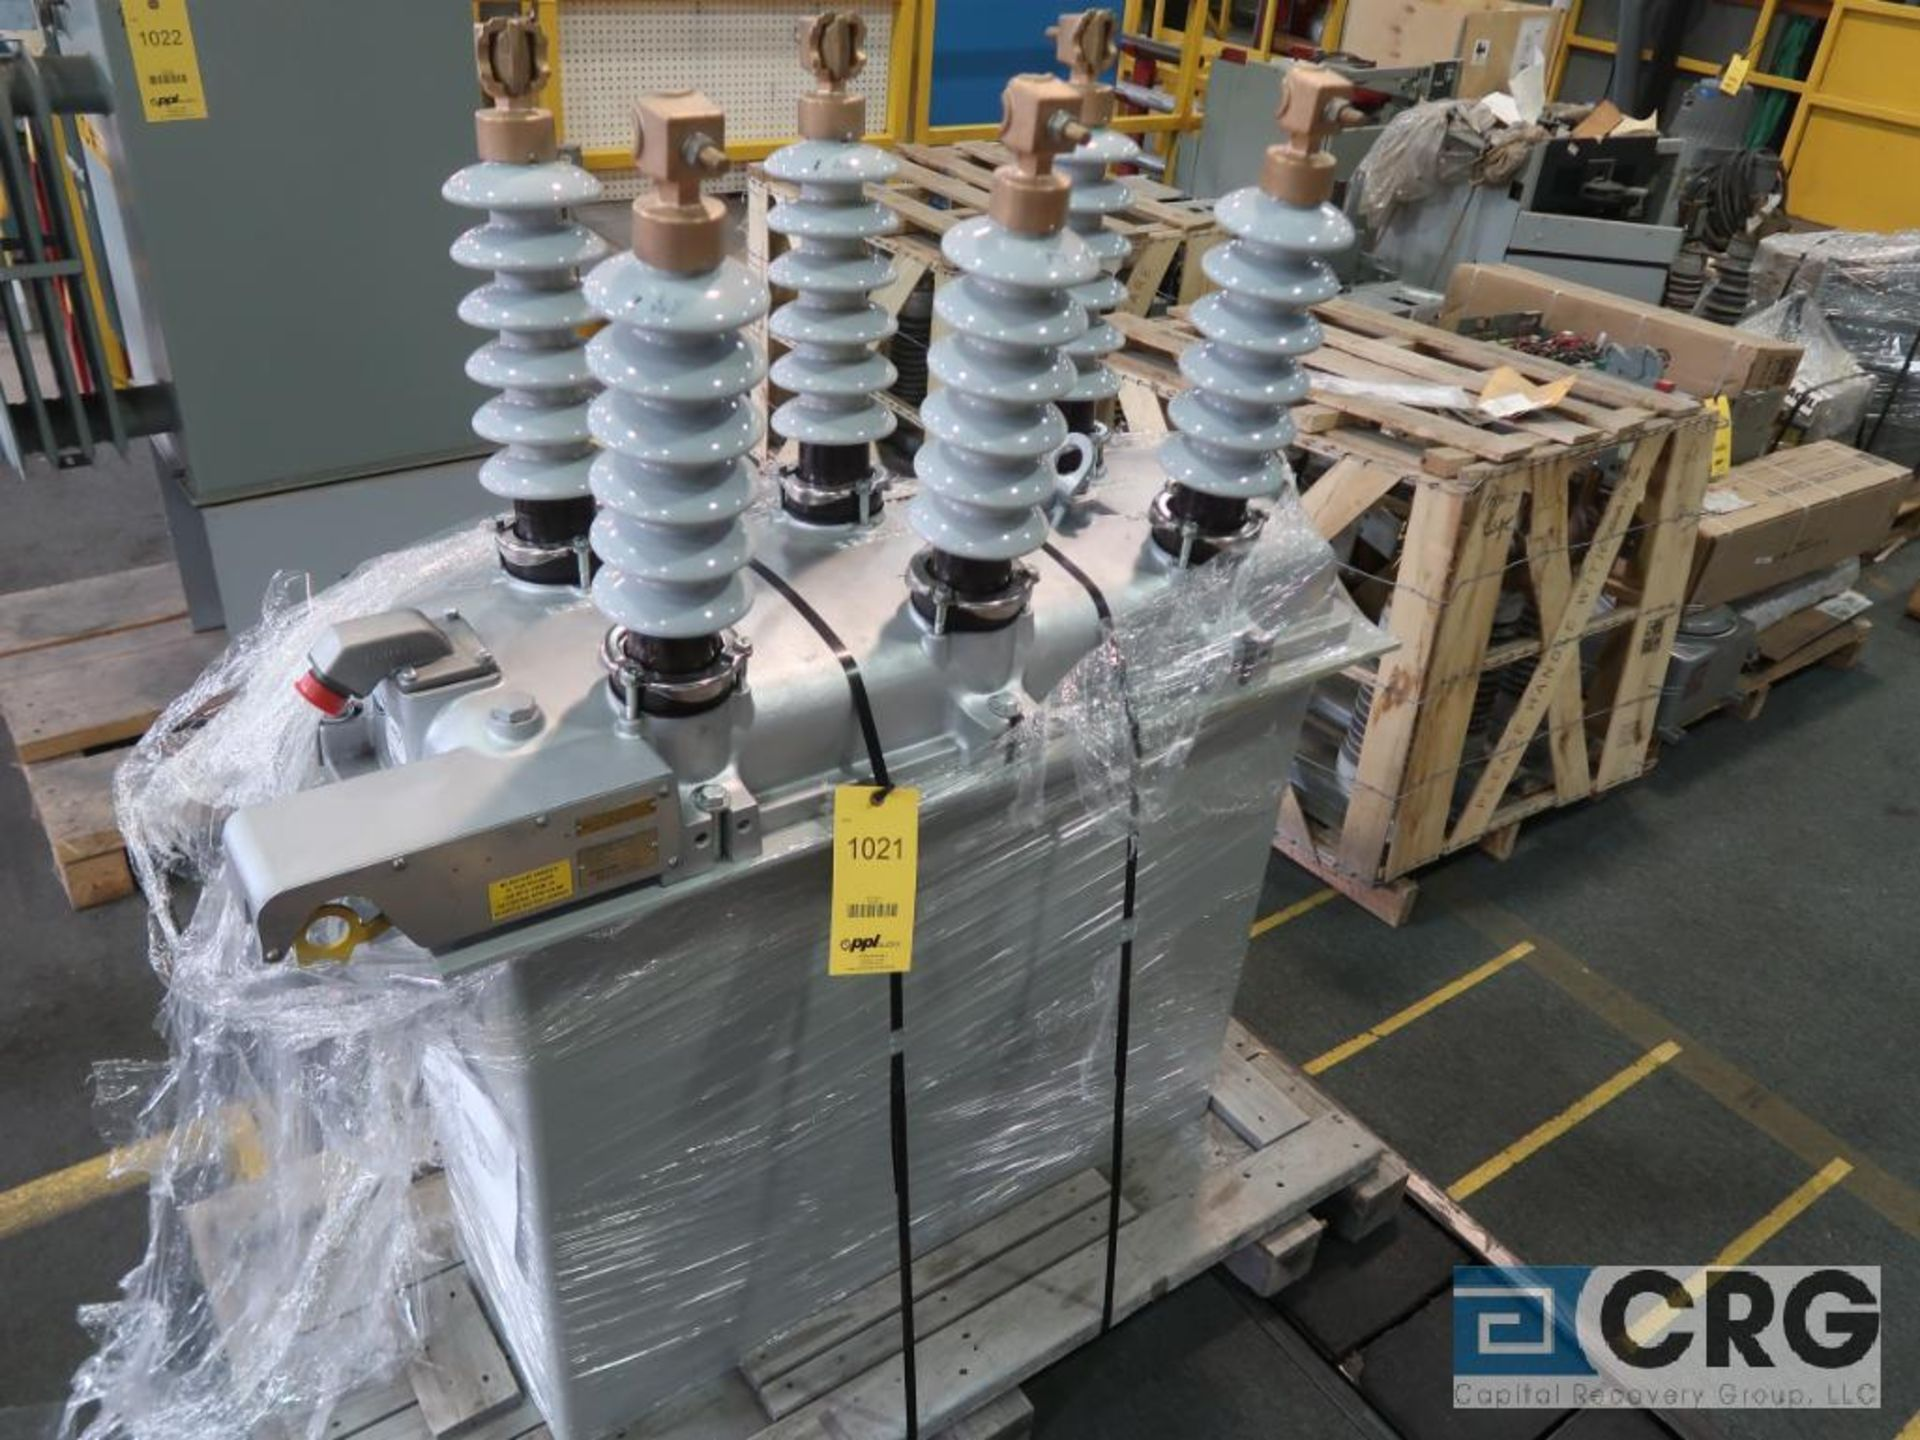 McGraw-Edison 27 KVA transformer, s/n 4424 (Finish Building)